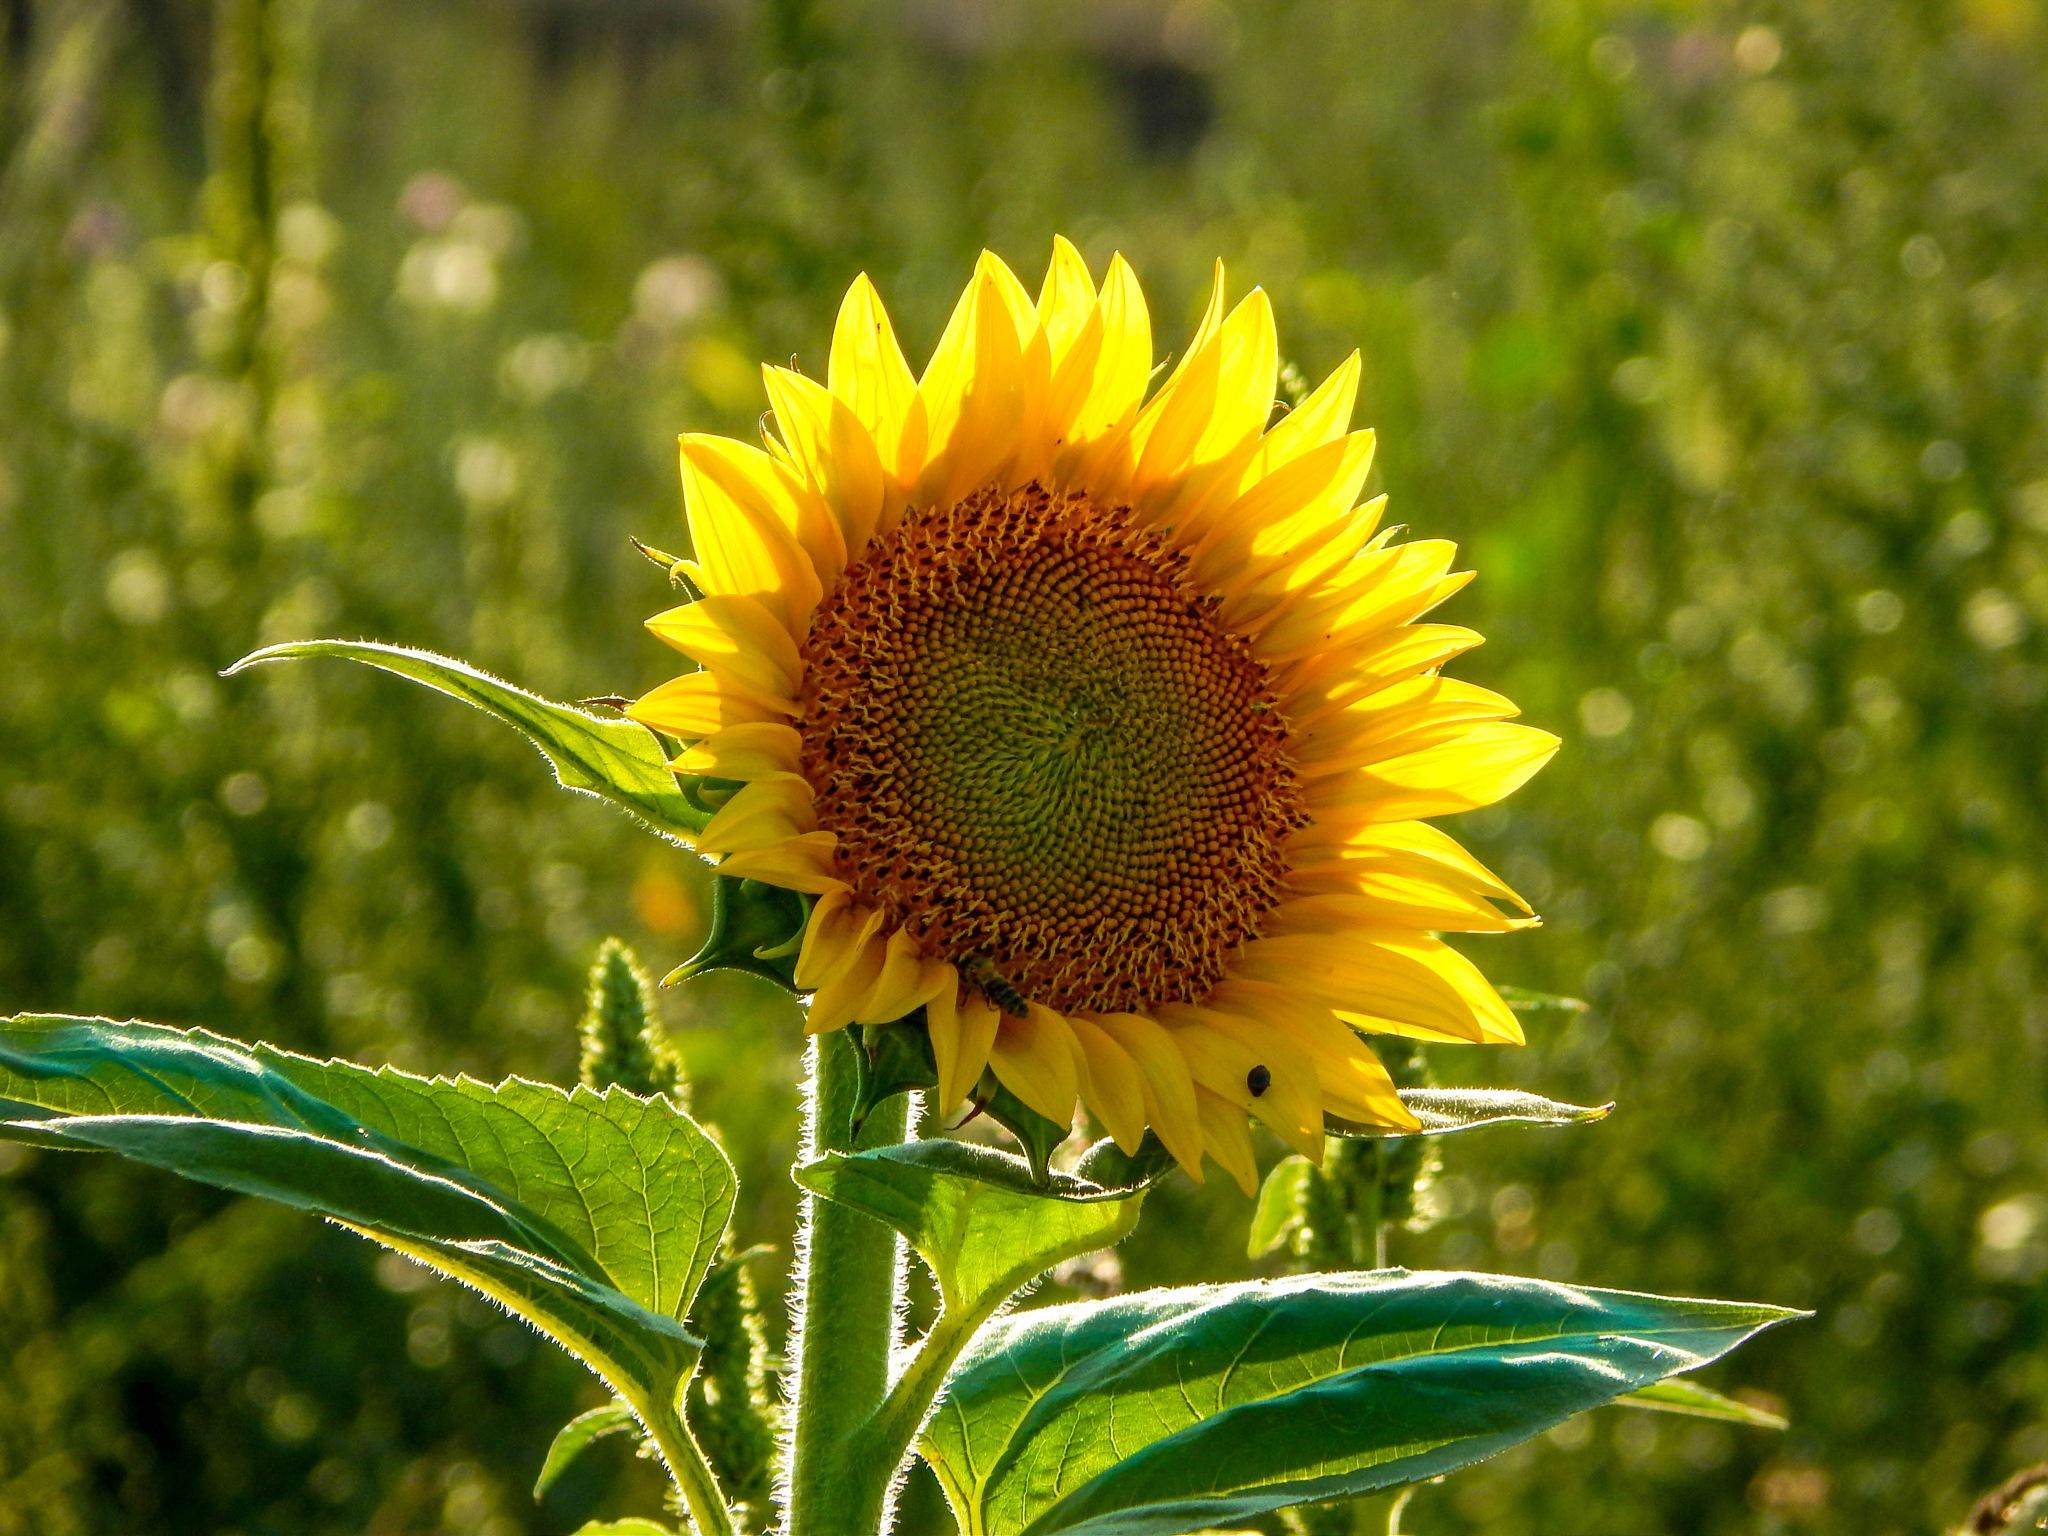 Sunflower by Balazs Kosaras